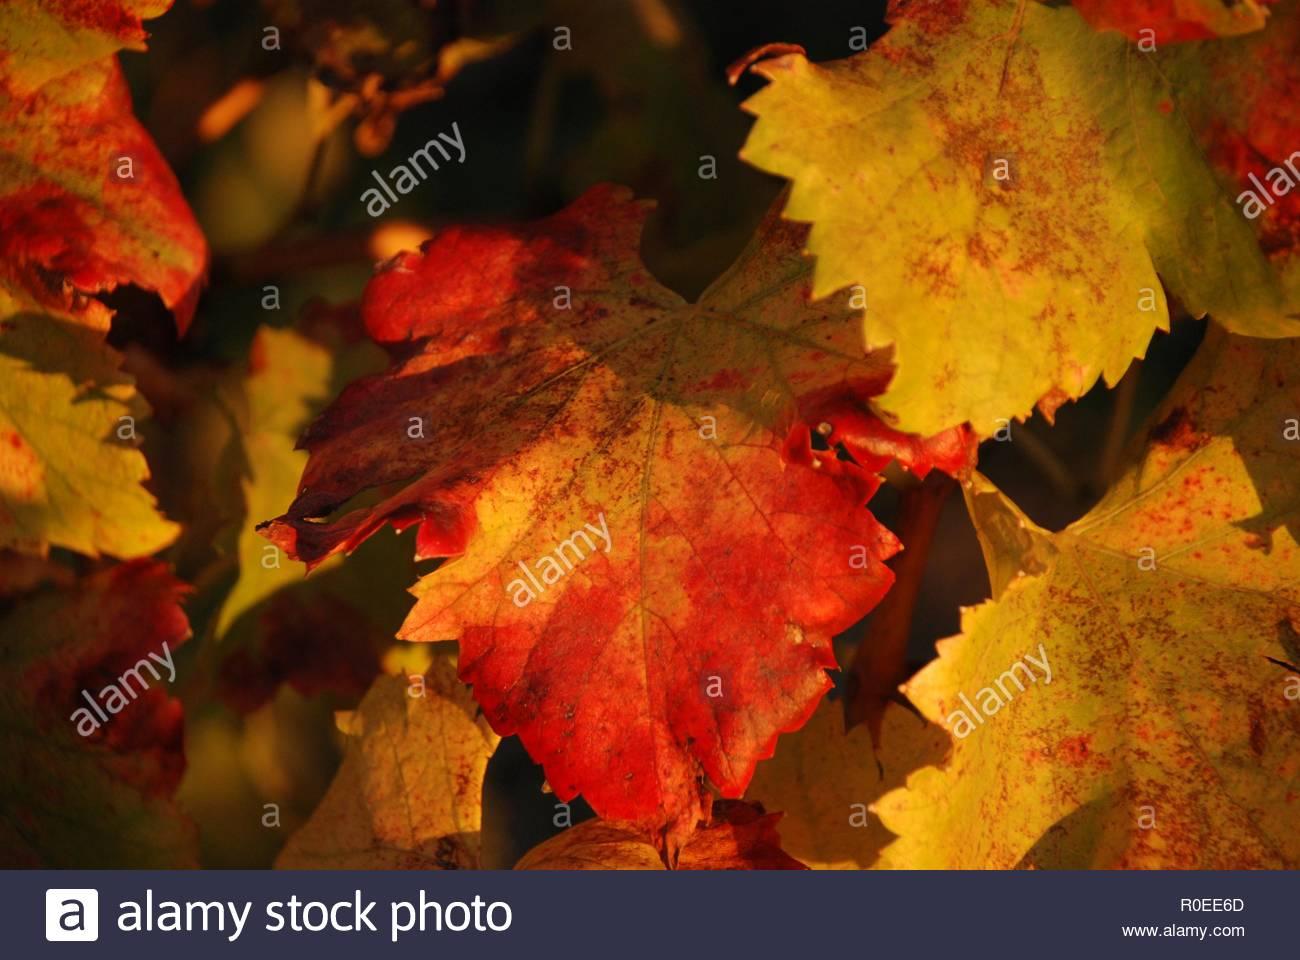 Herbst weinlaub stockbild